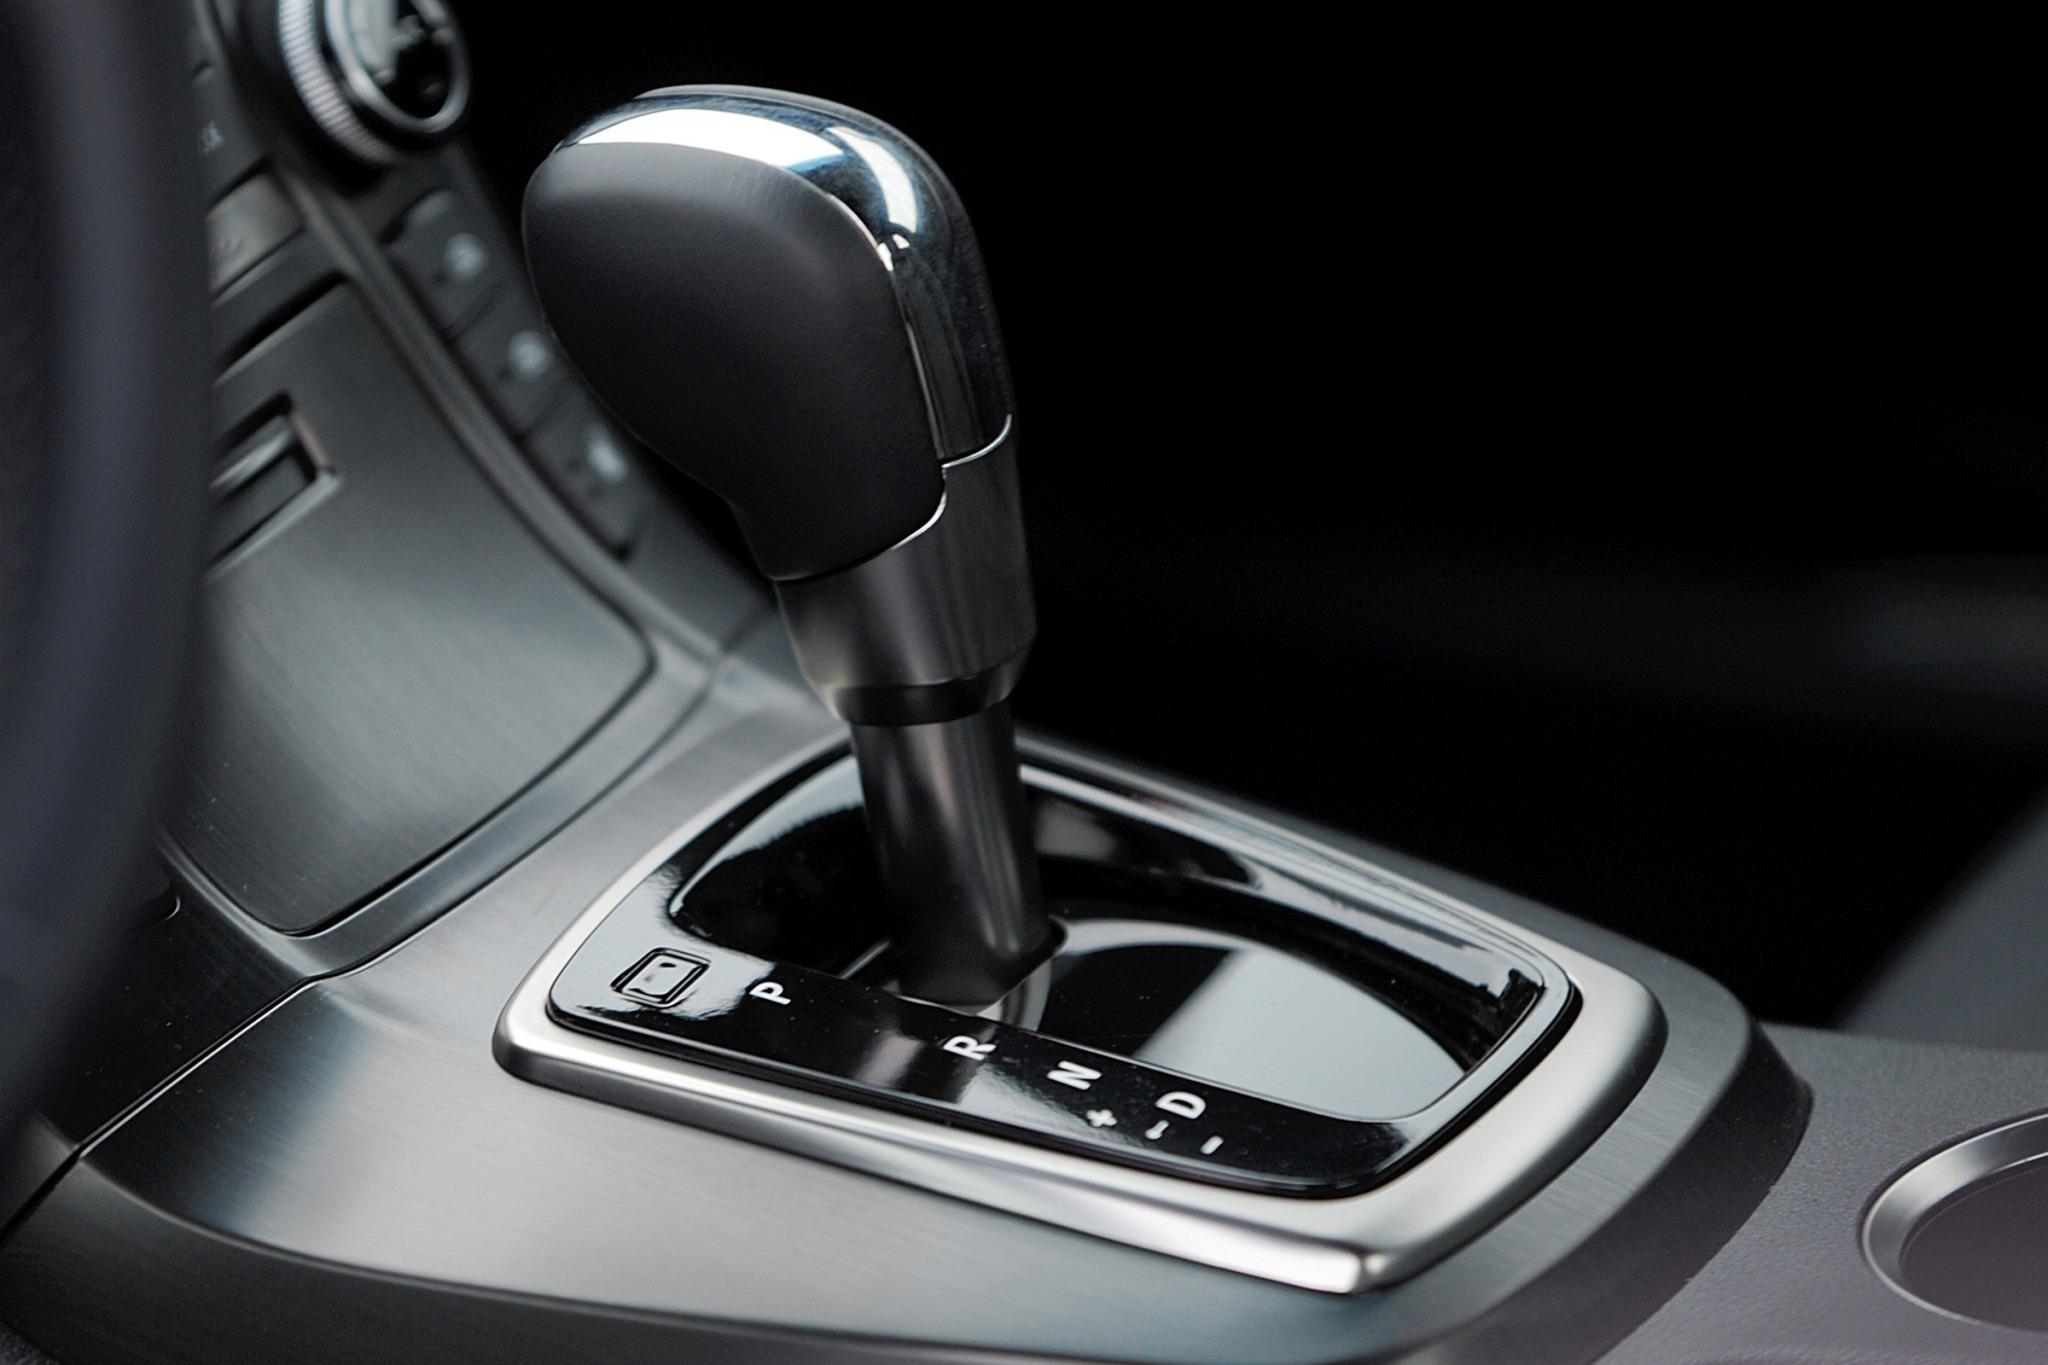 2016 hyundai genesis coupe 3 8 6mt vin lookup autodetective - 2016 hyundai genesis sedan interior ...